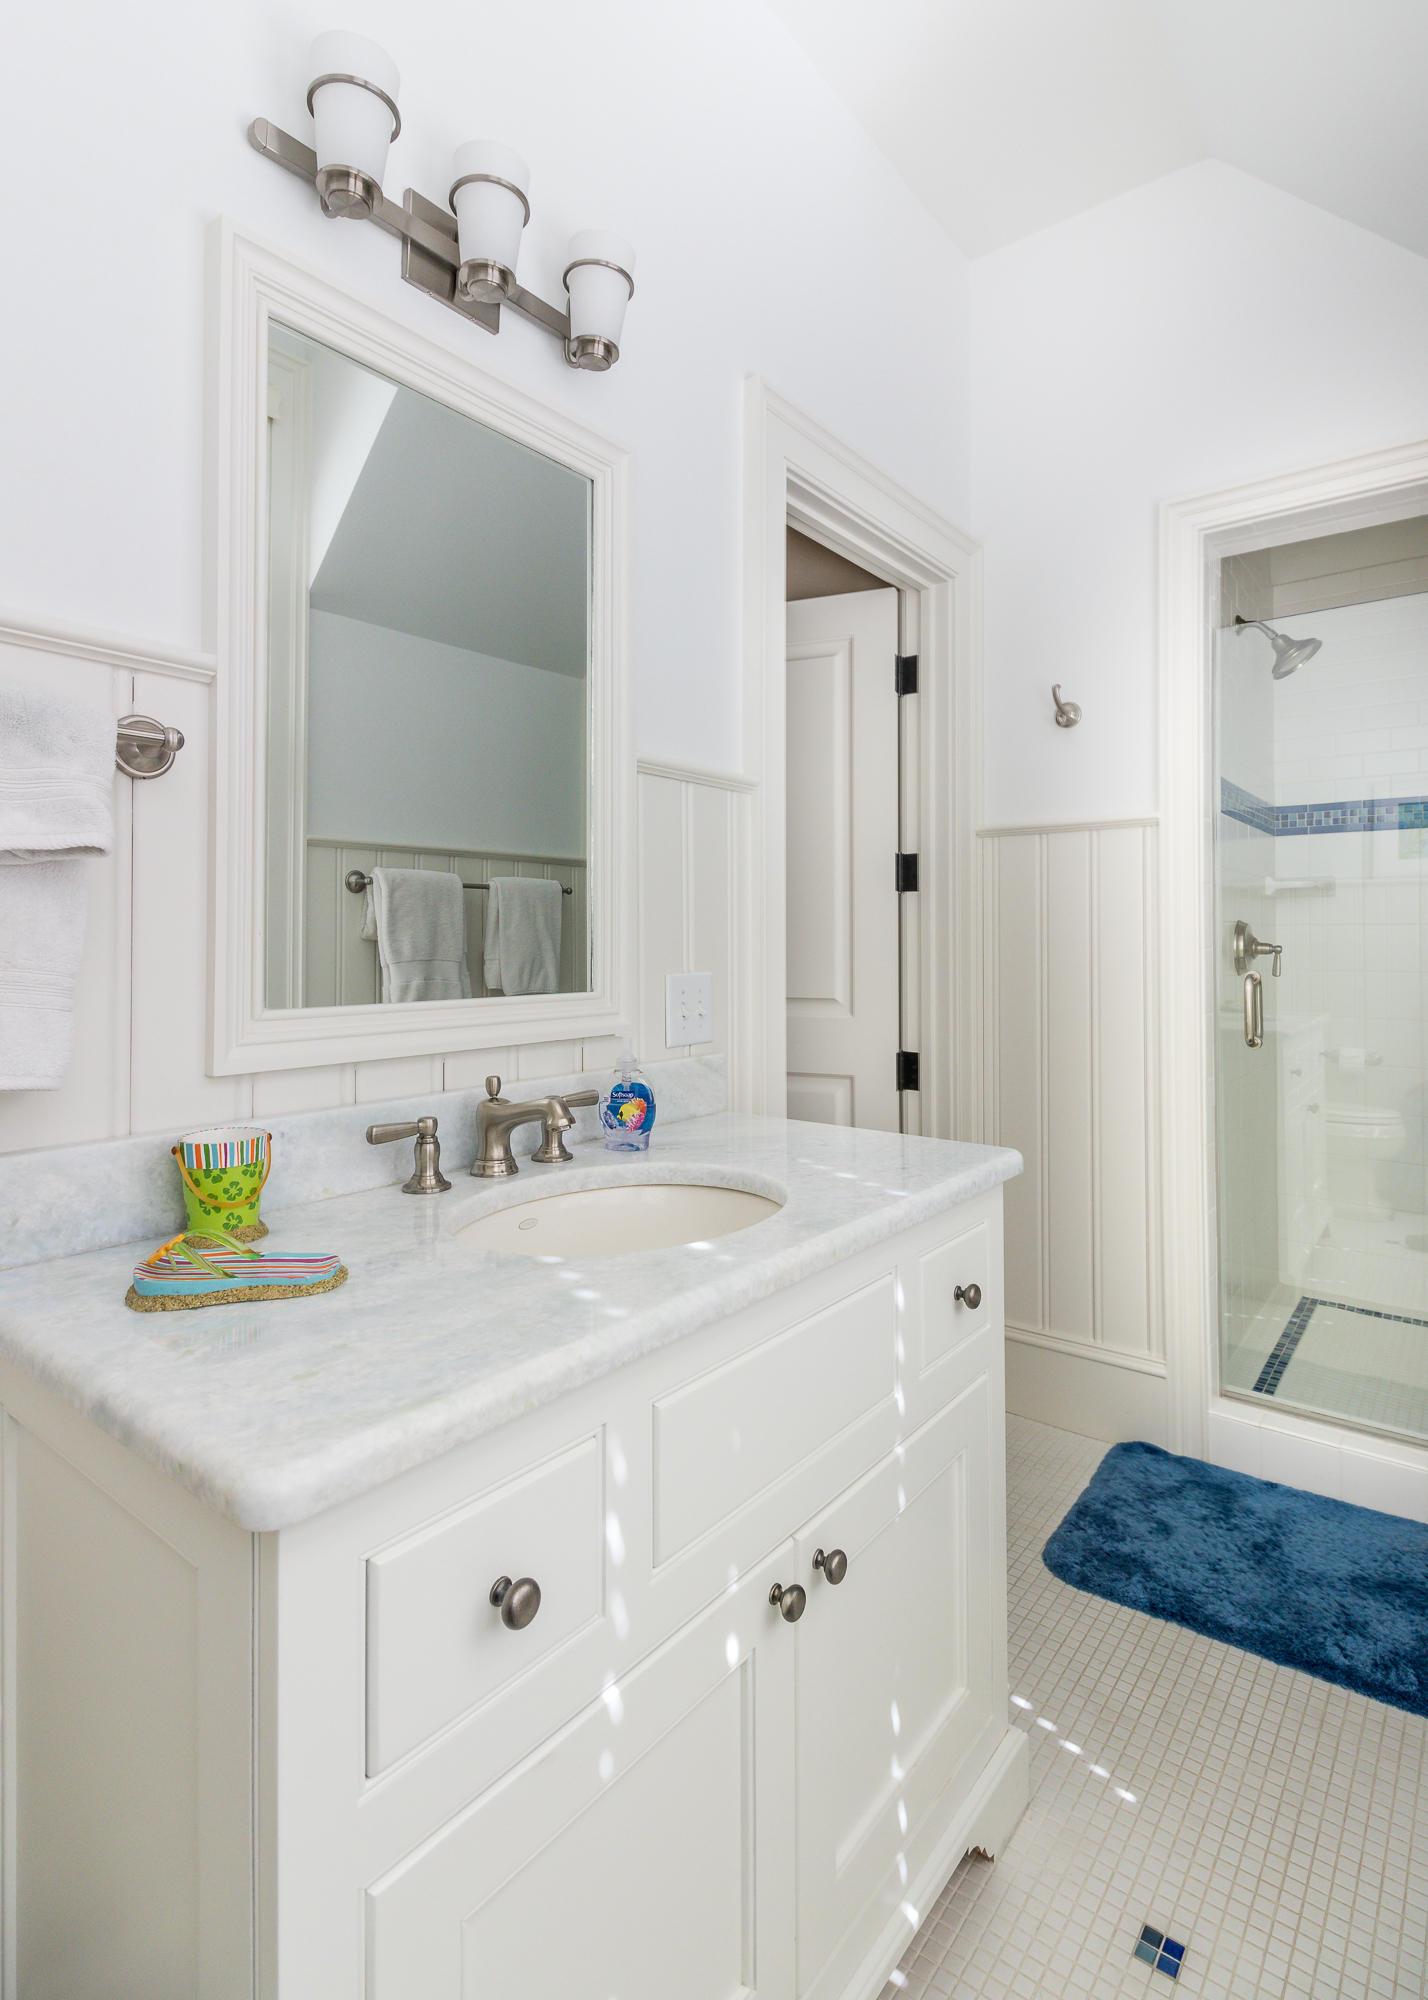 Egret/Pintail Homes For Sale - 117 Bufflehead, Kiawah Island, SC - 29